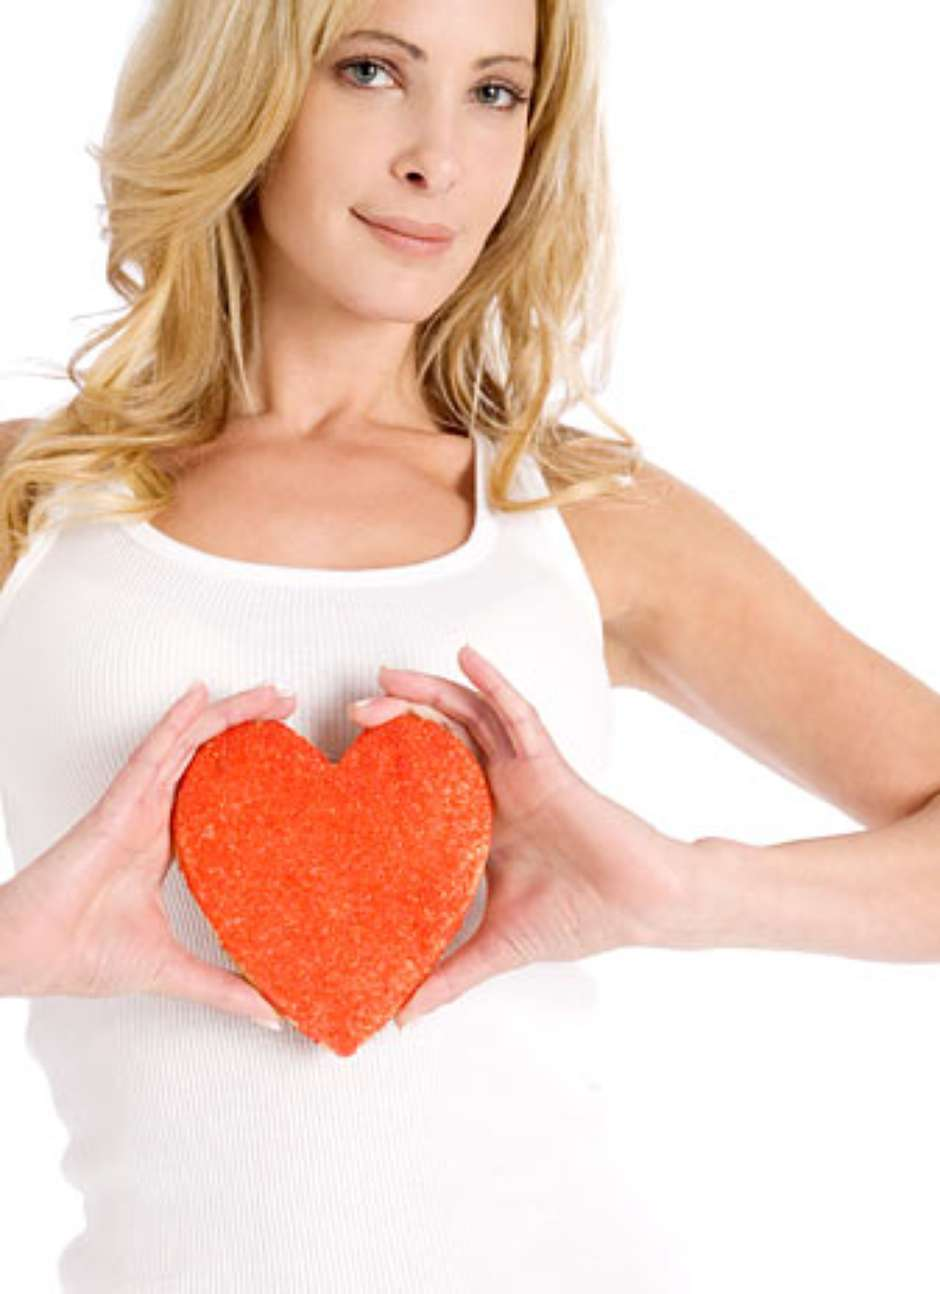 alimentacao-para-cardiacos